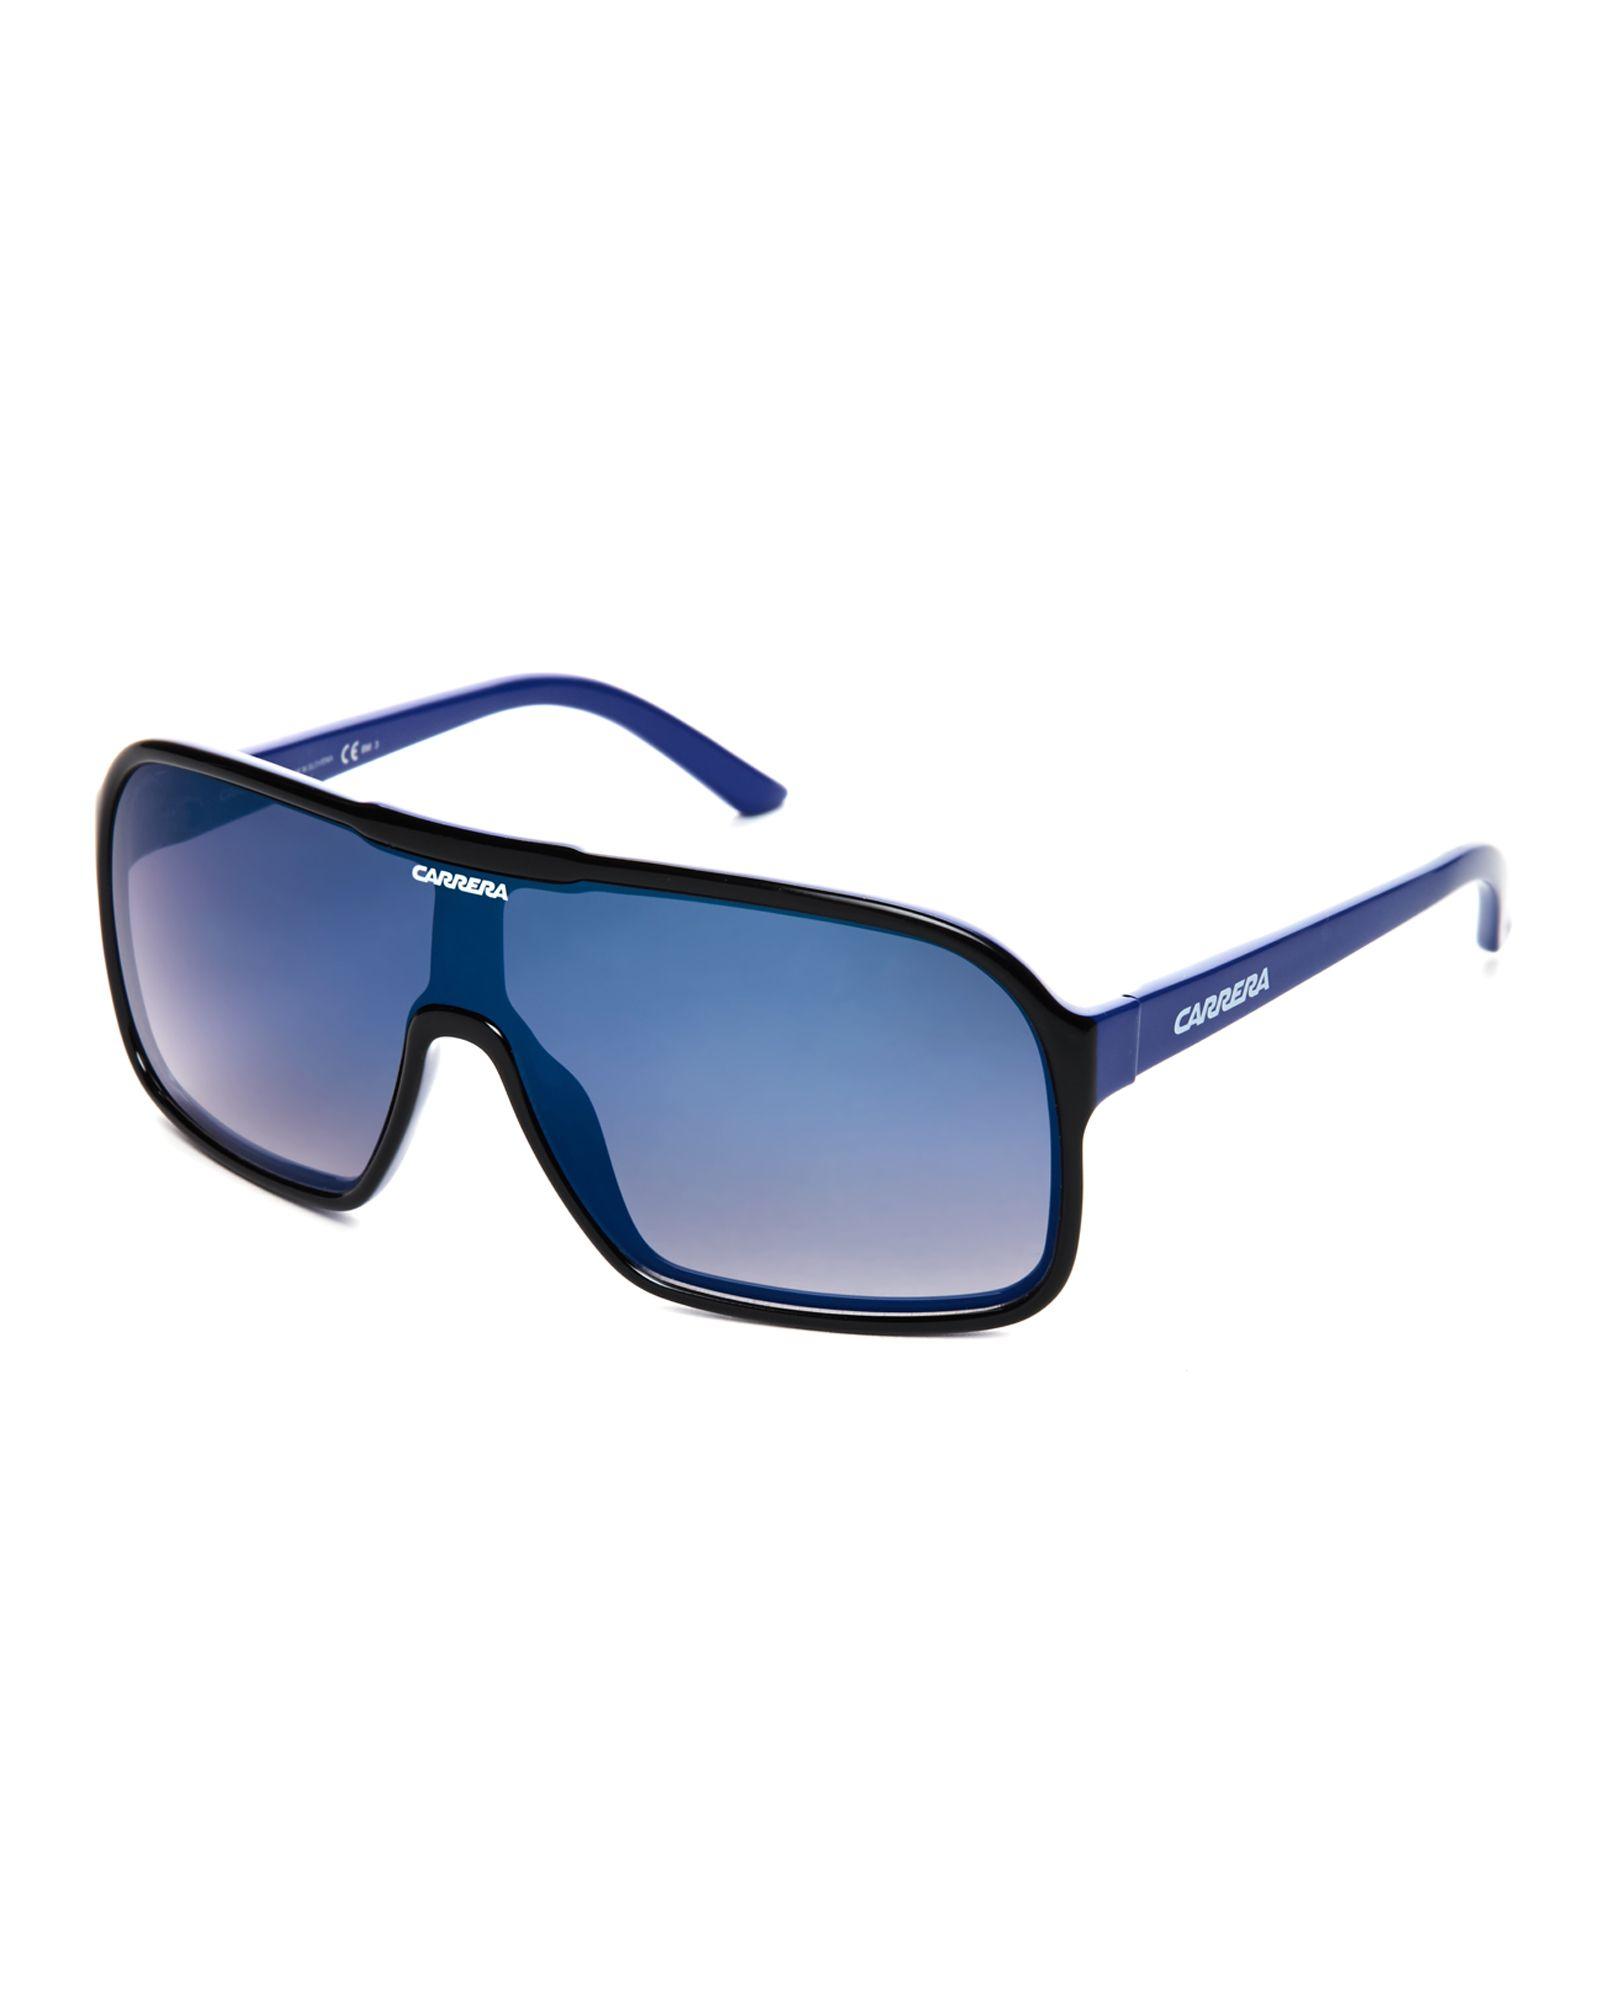 6ea4f4ac58a Carrera Black   Blue 5530 S Shield Sunglasses